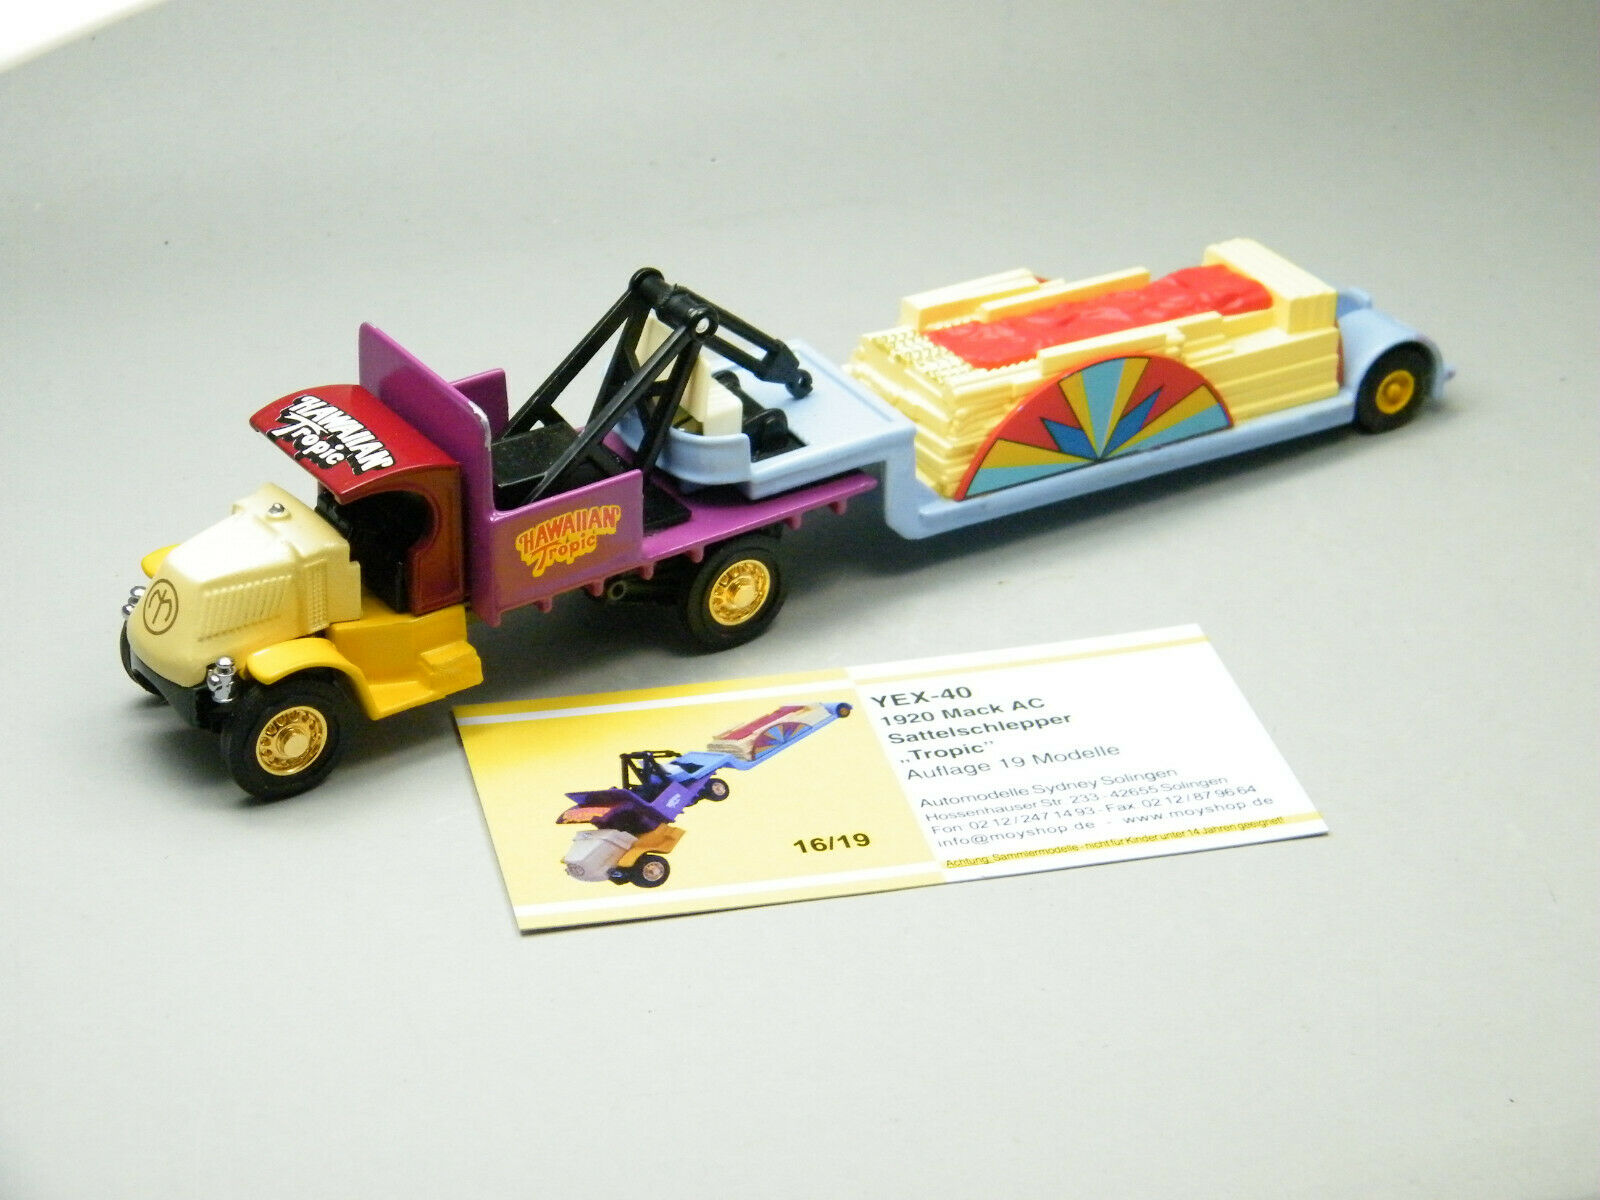 Matchbox moy código 2 yex-40 mack camión con remolque  feriantes  caja de madera 1 de 9